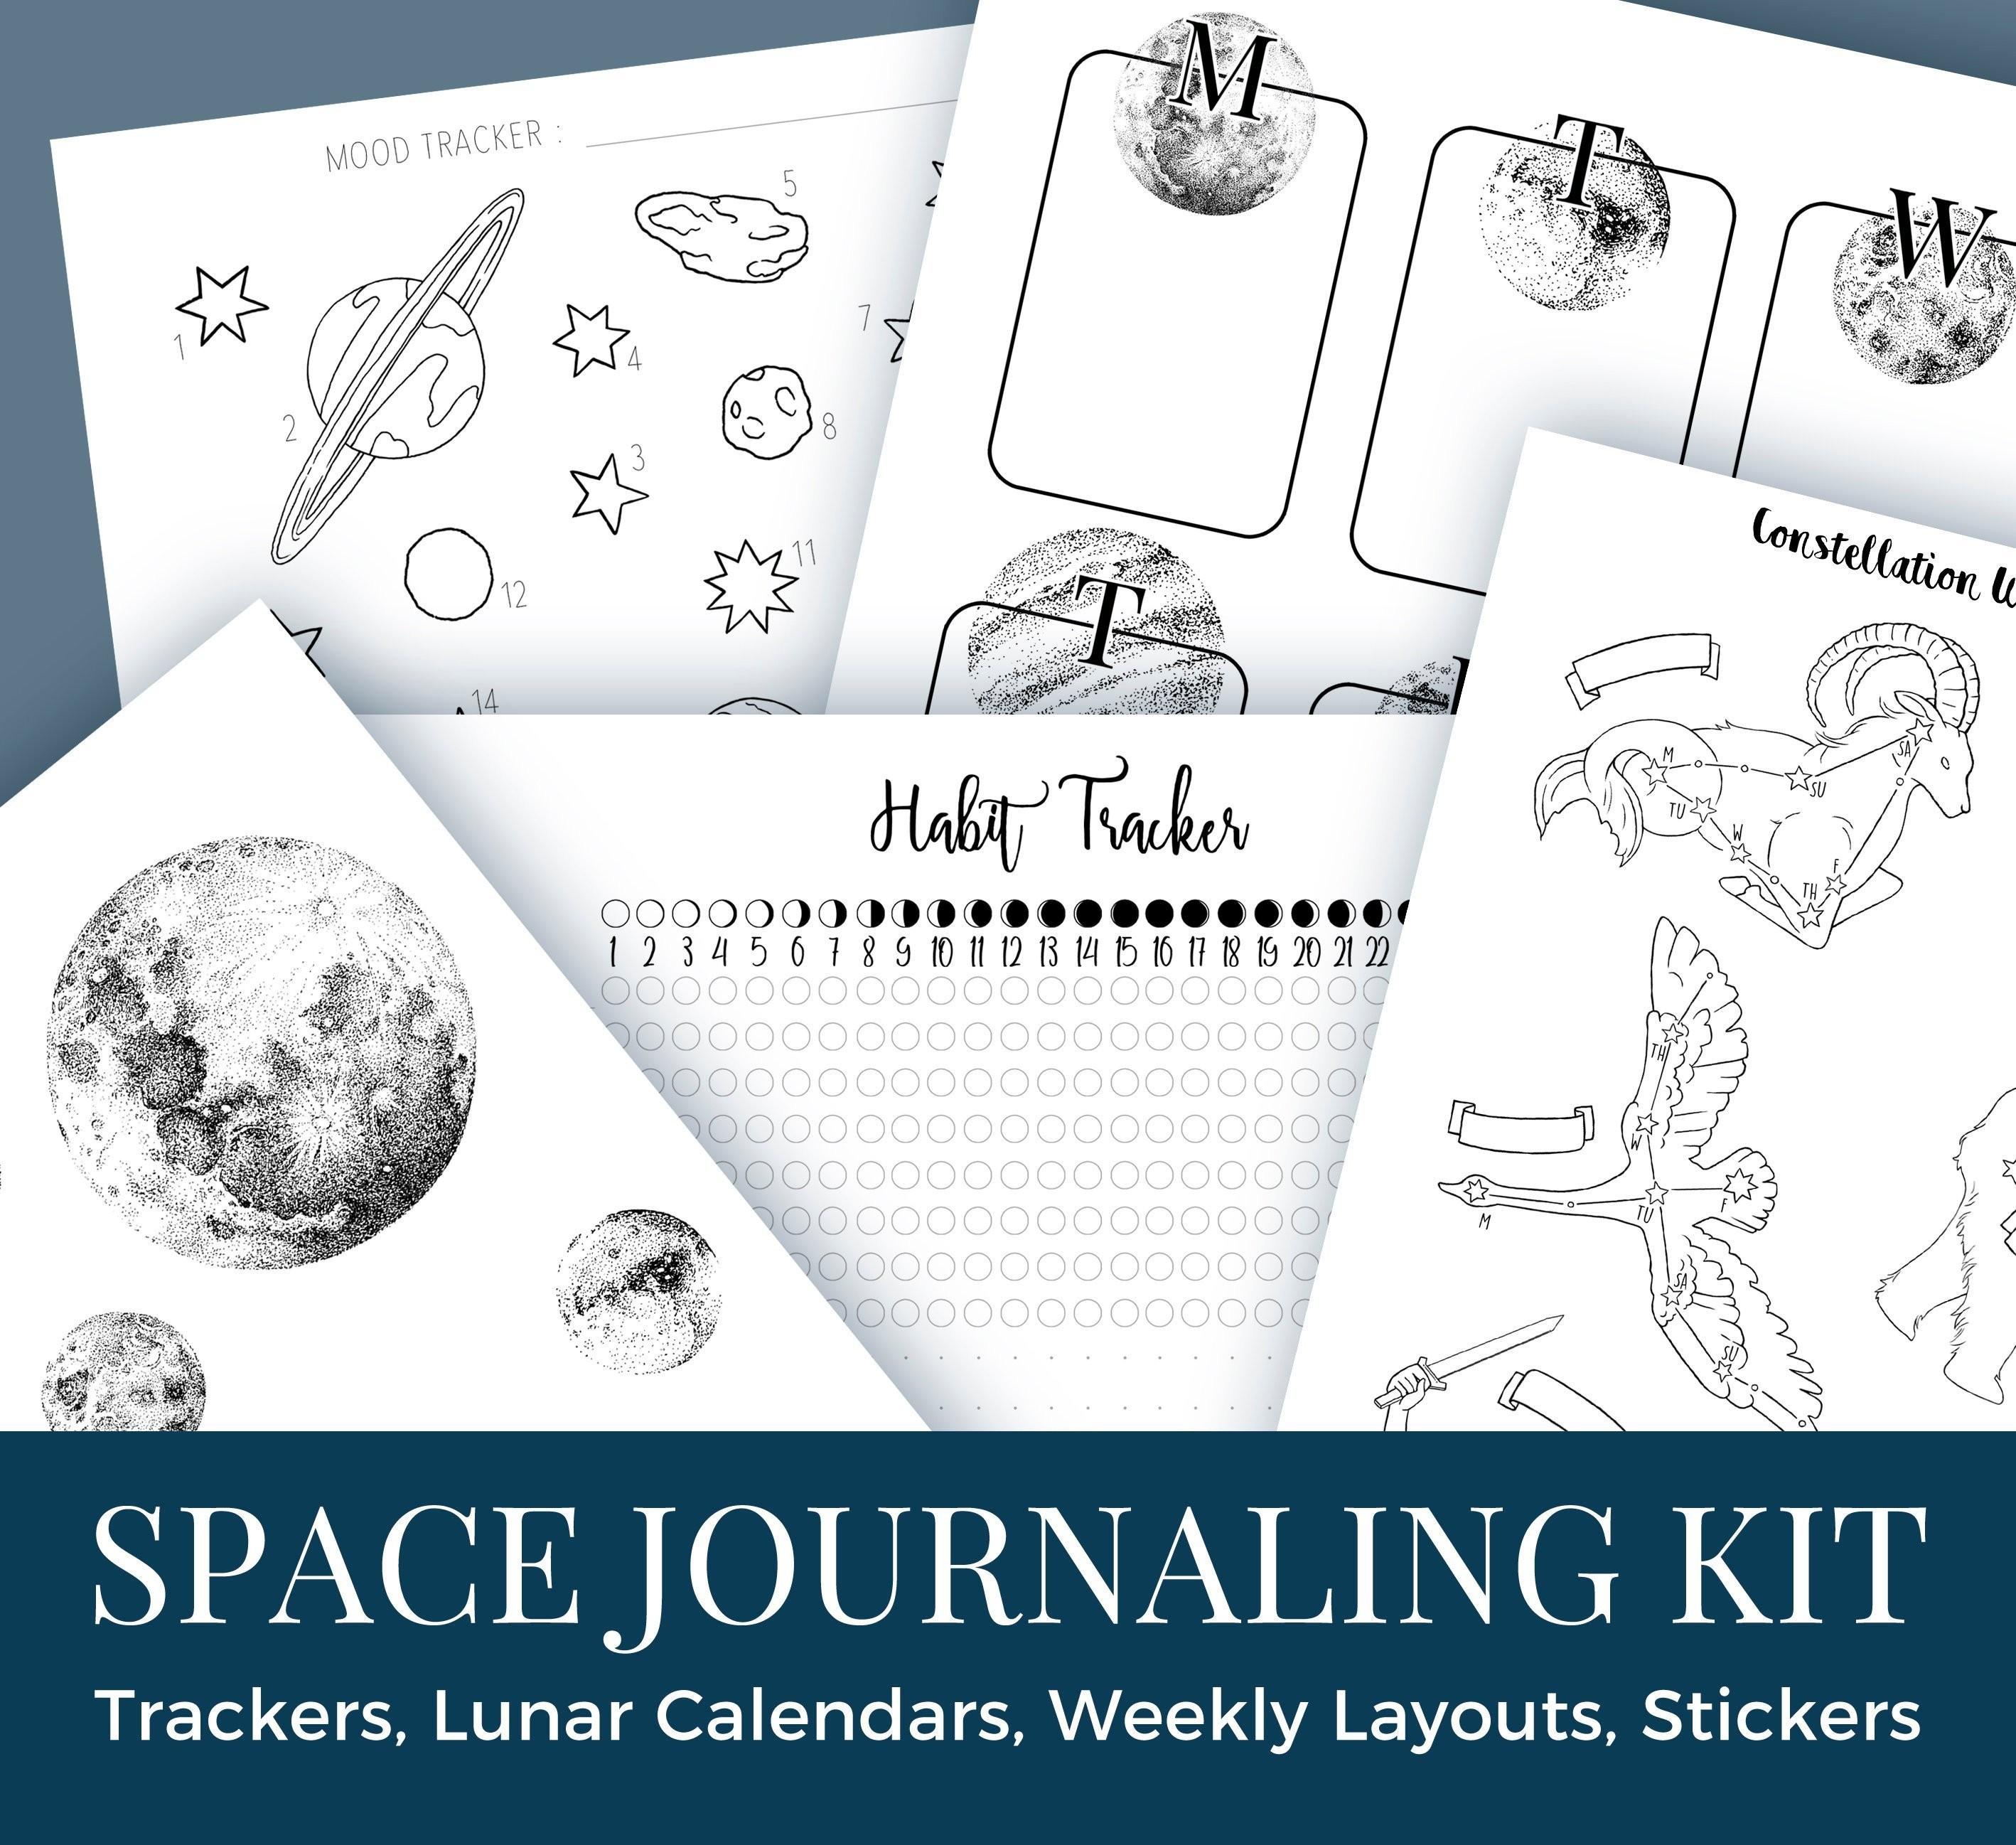 March 2019 Calendar Sri Lanka Más Caliente 2019 Bullet Journal Space Kit Printable Moon & Stars Of March 2019 Calendar Sri Lanka Más Arriba-a-fecha events City Nomads